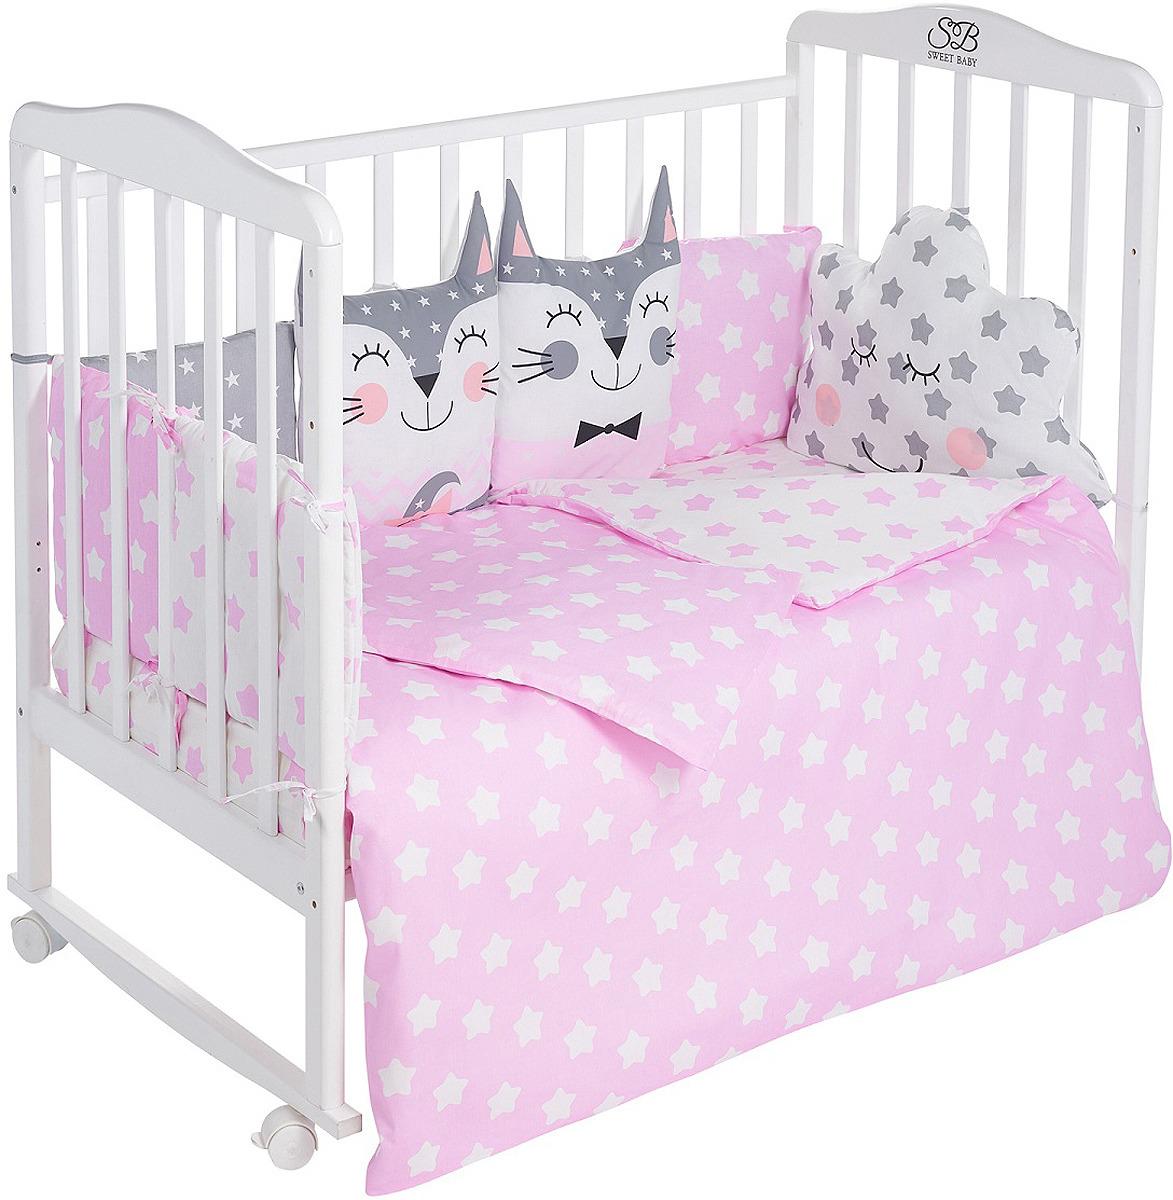 цена Комплект в кроватку Sweet Baby Gioia Rosa, 423285, розовый, 4 предмета онлайн в 2017 году